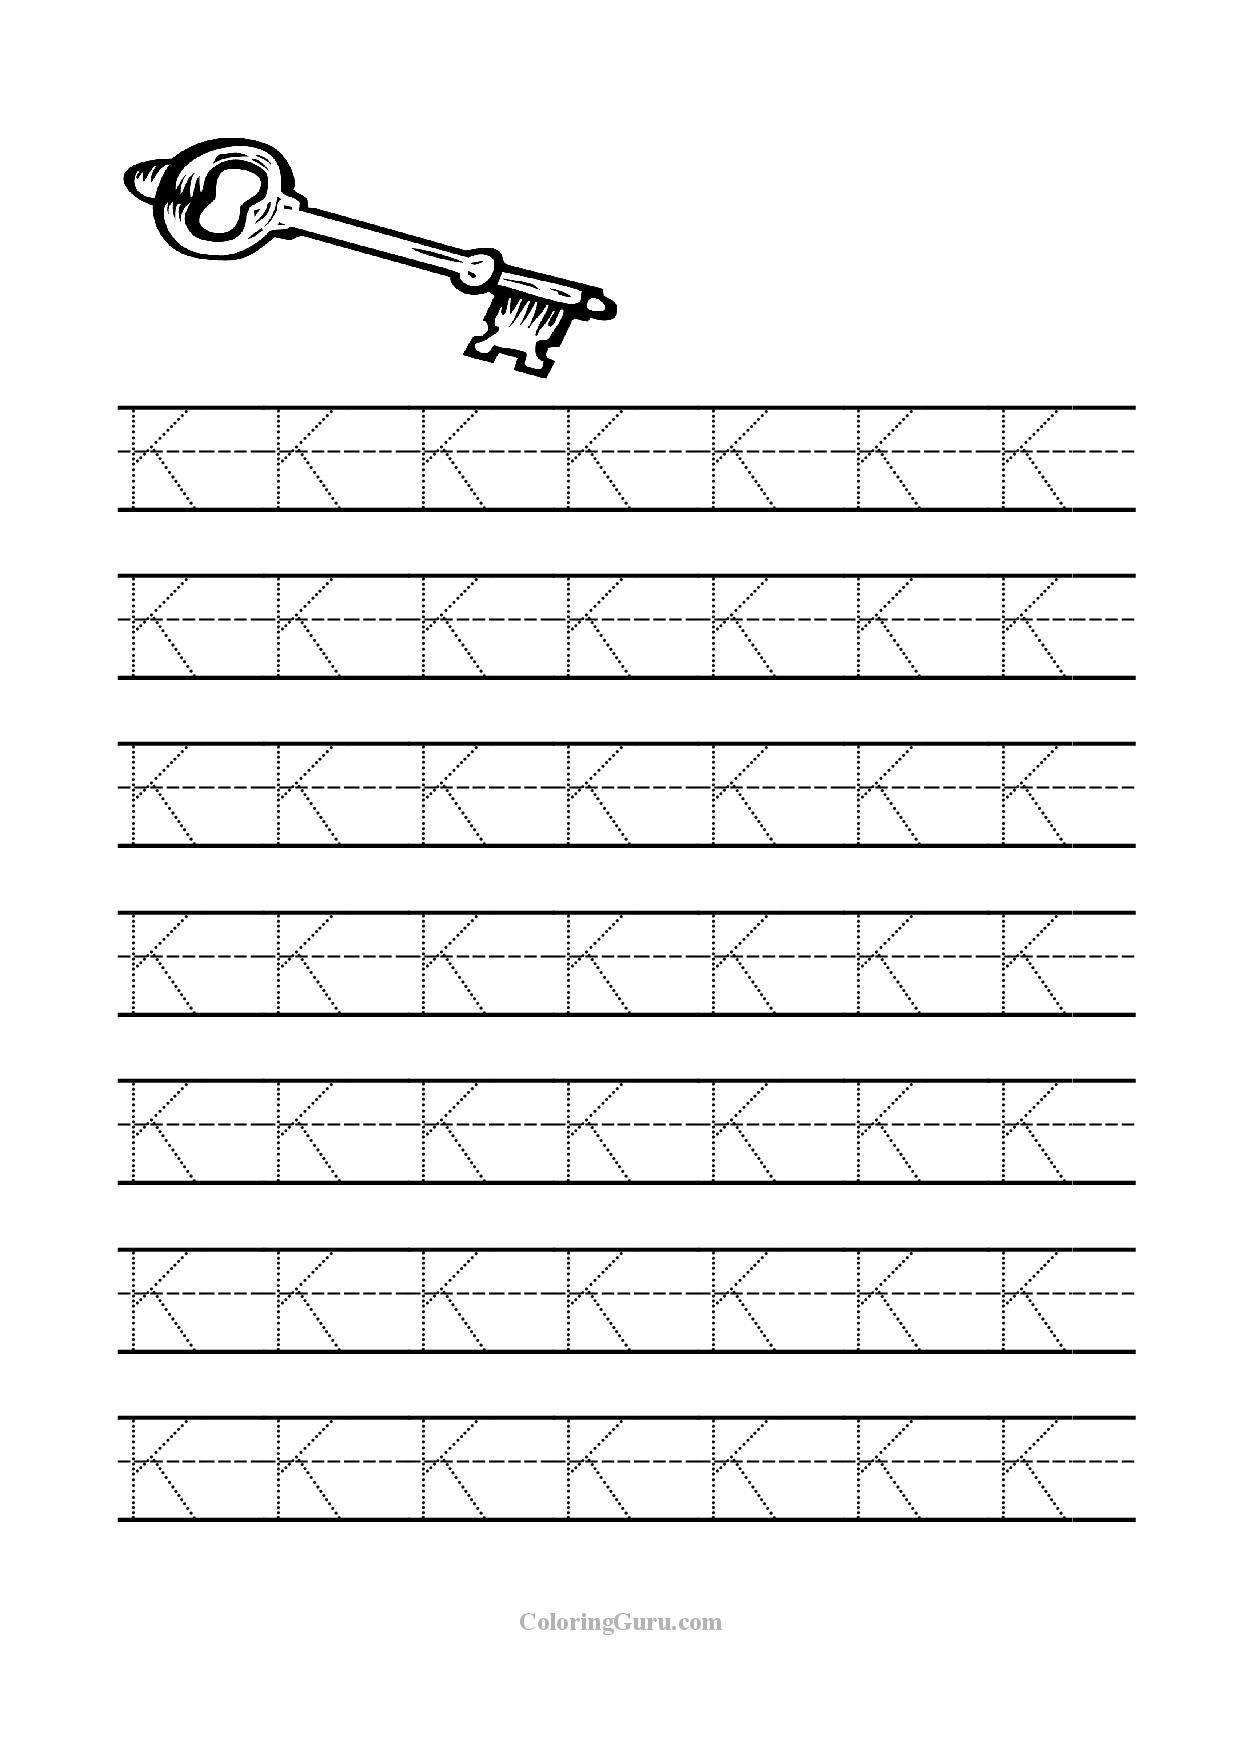 Free Printable Tracing Letter K Worksheets For Preschool